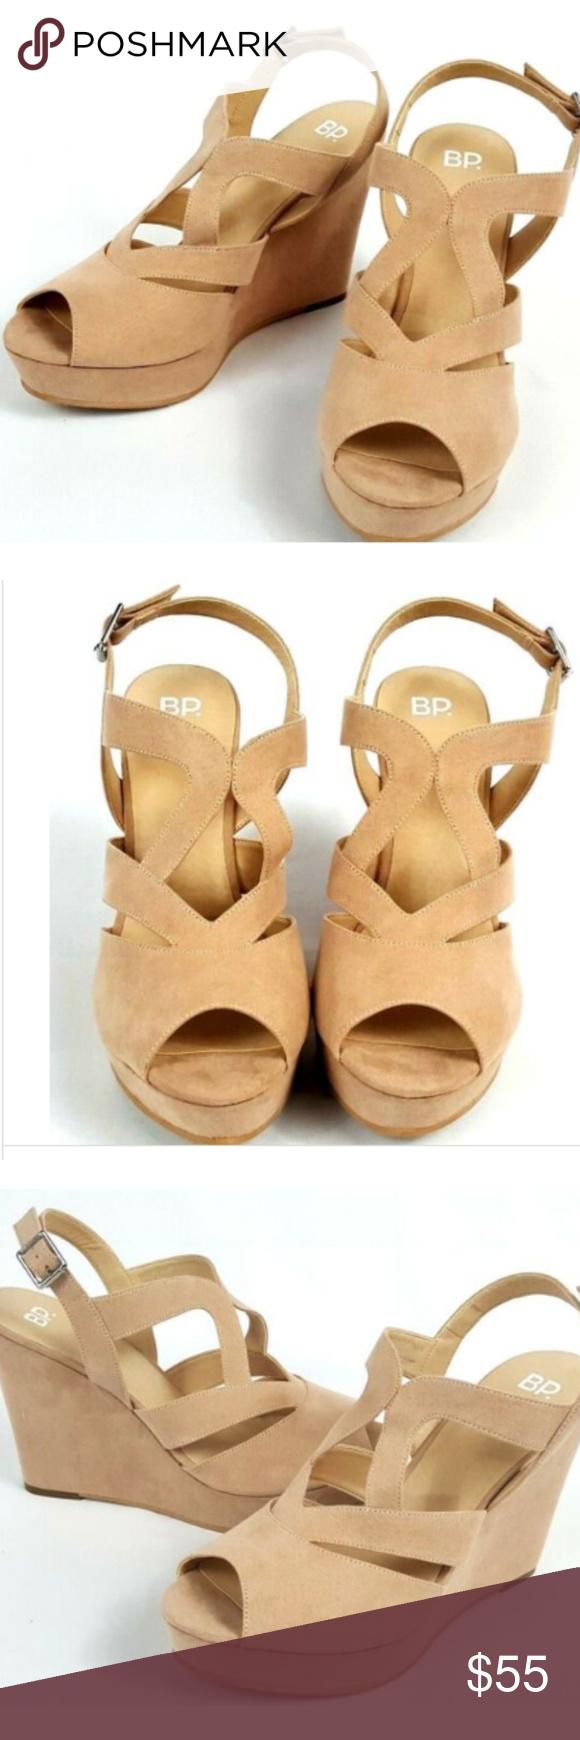 5baa995c2e4 Sunny Platform Wedge Sandal (Women) Shoe BP. Sunny Platform Wedge Sandal